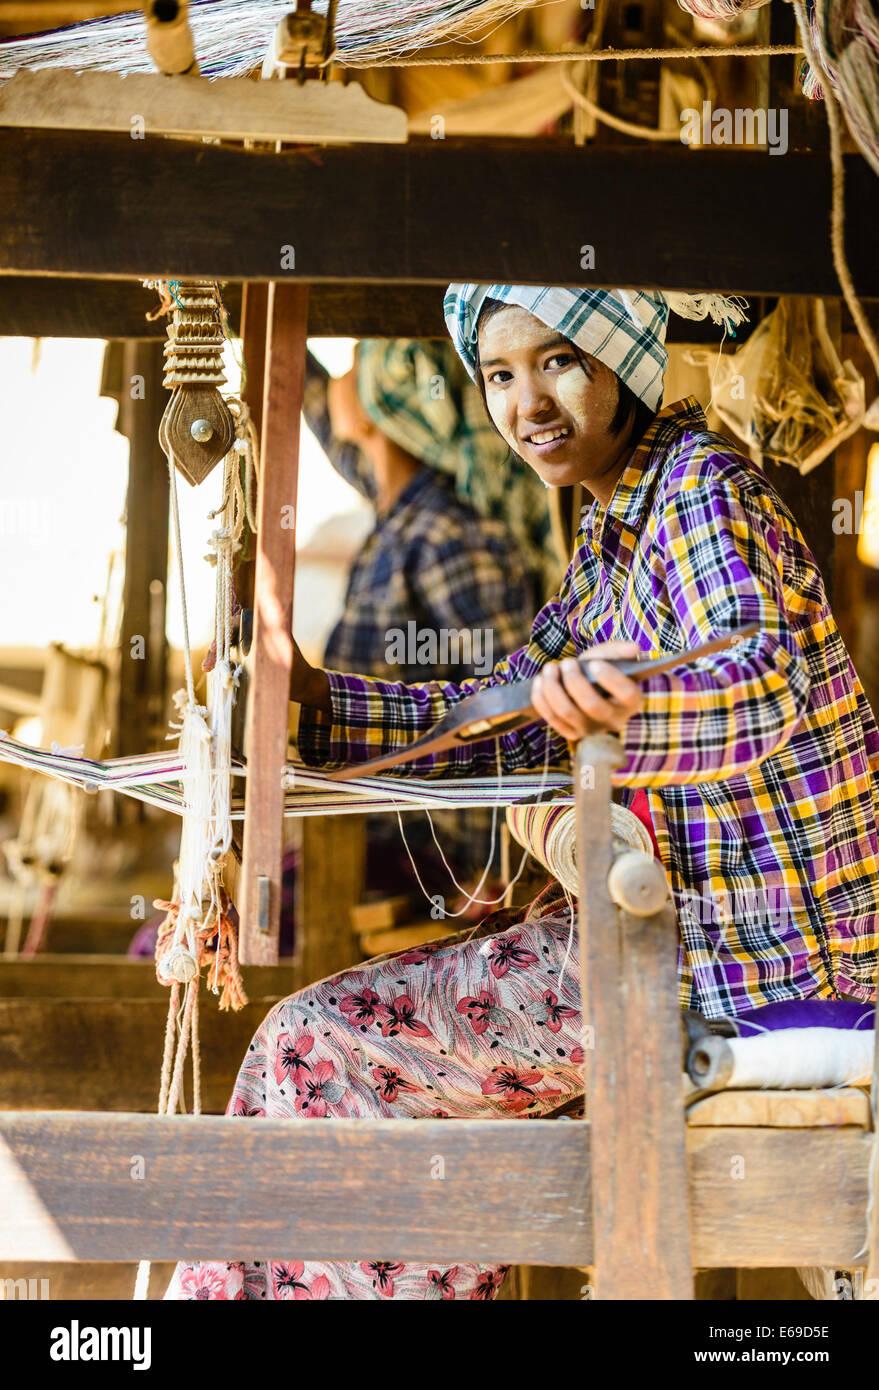 Asian girl weaving fabric - Stock Image